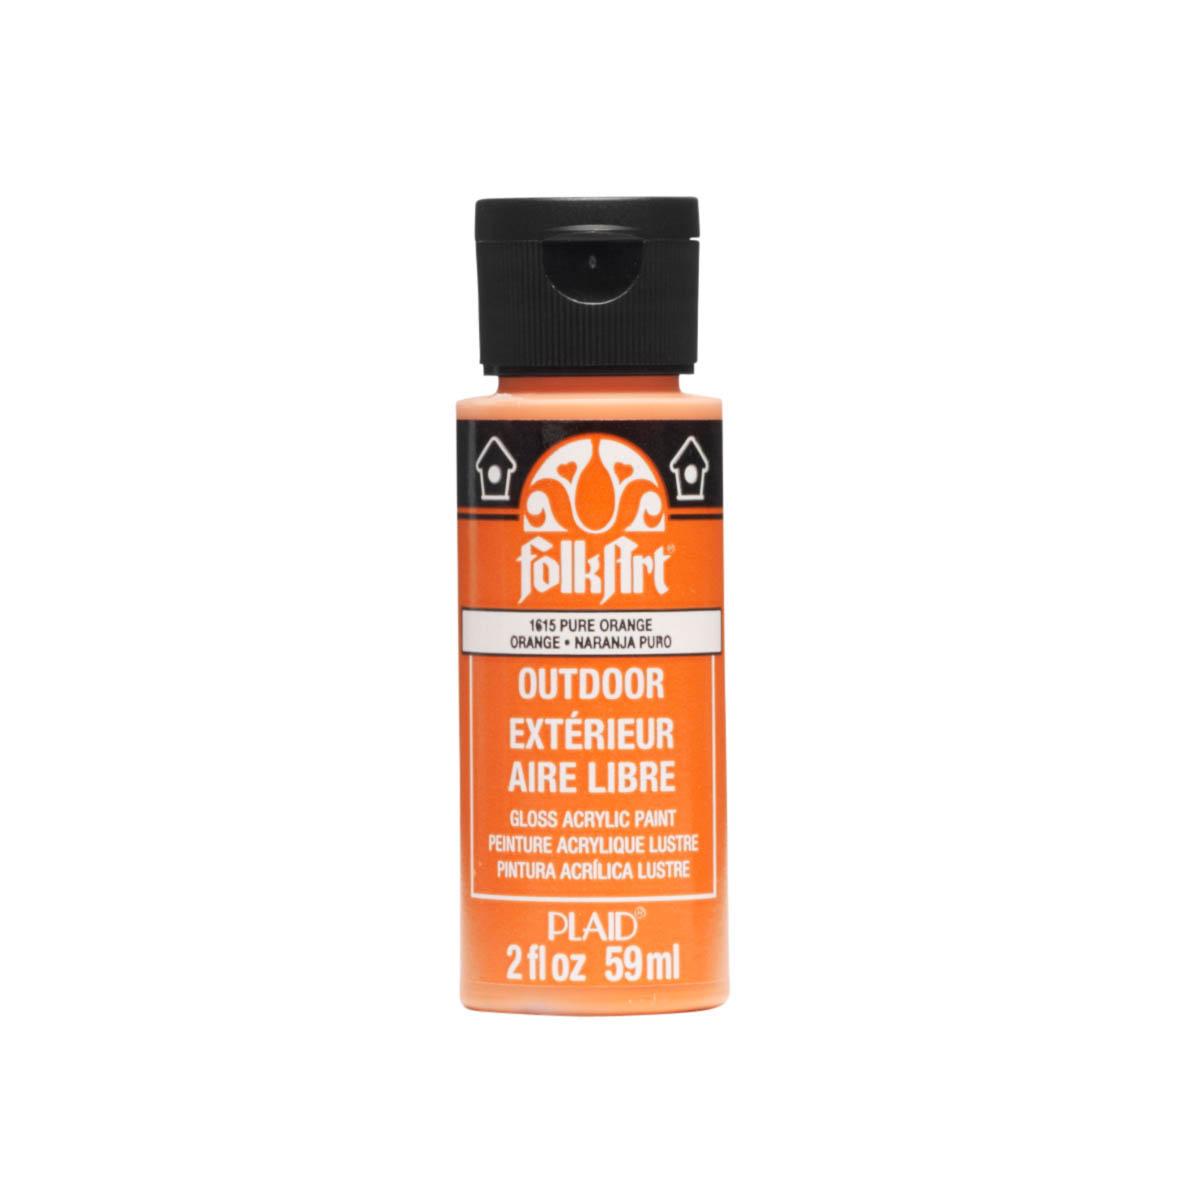 FolkArt ® Outdoor™ Acrylic Colors - Pure Orange, 2 oz. - 1615